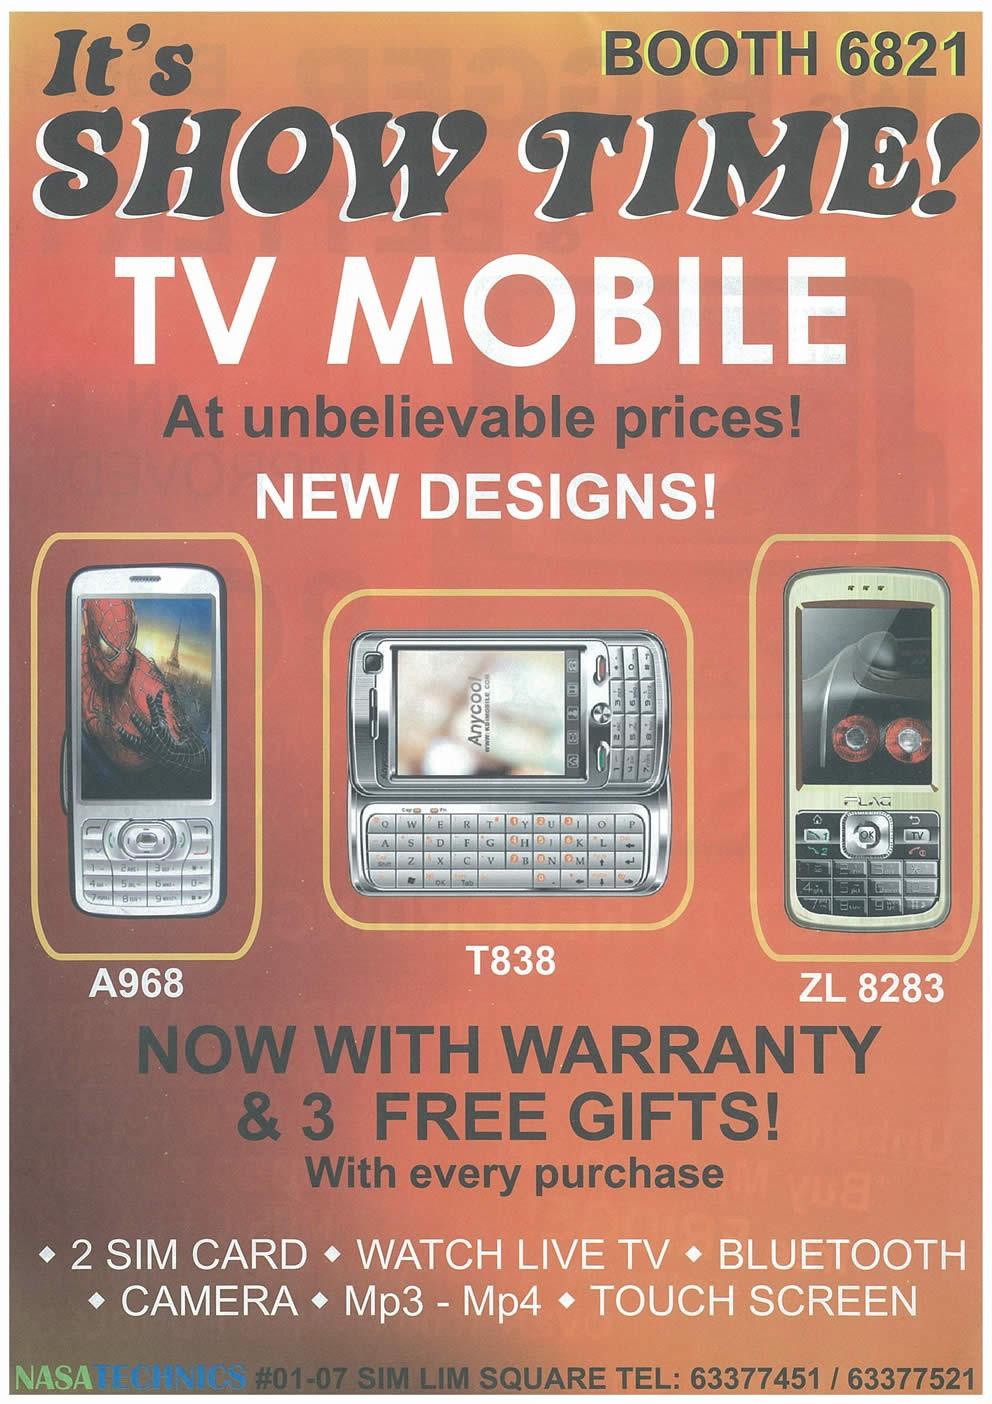 Comex 2008 price list image brochure of NASA TECHNICS Tv Mobile Page 2